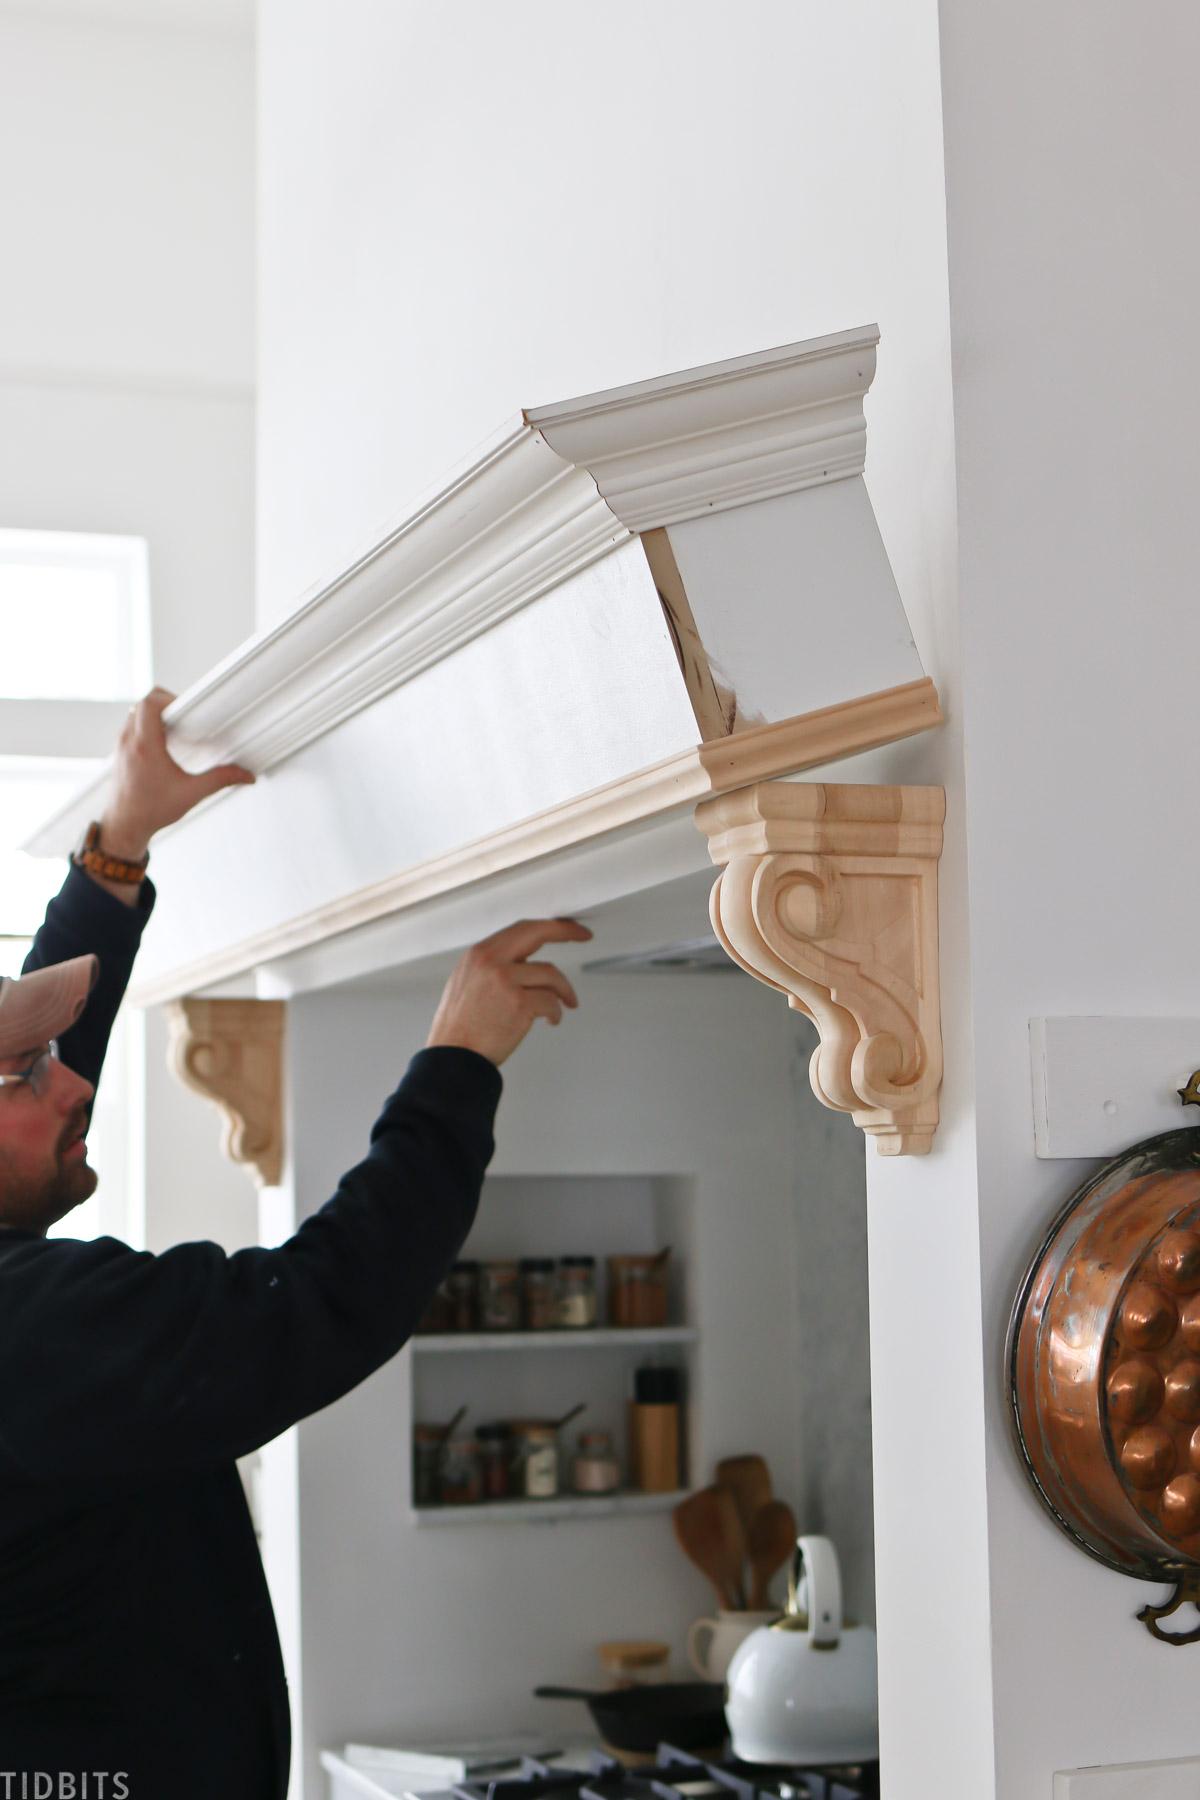 Installing shelf to surround a range hood area.